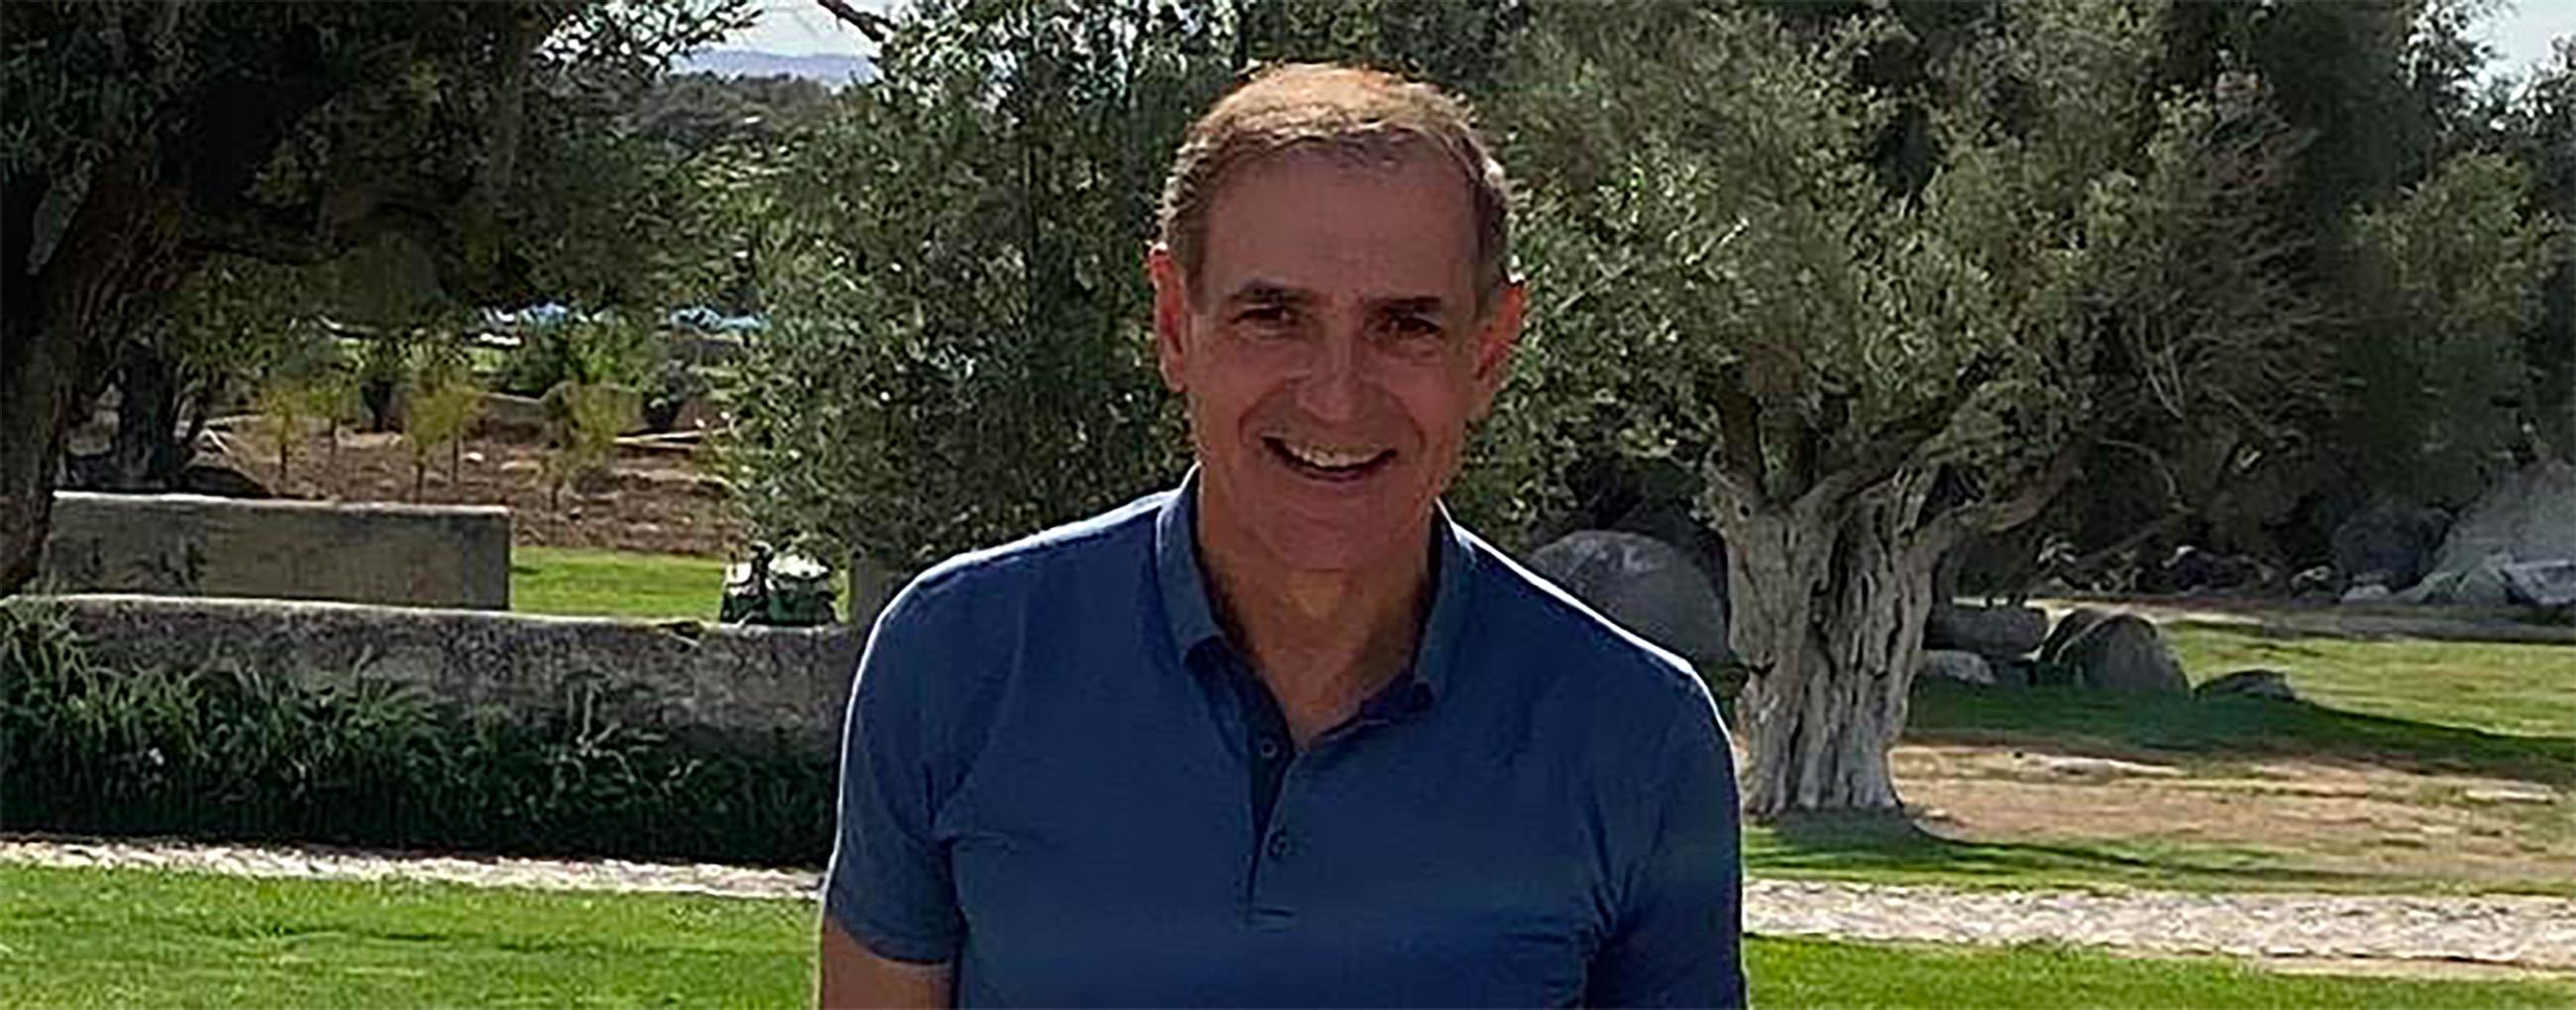 Jim Scopa